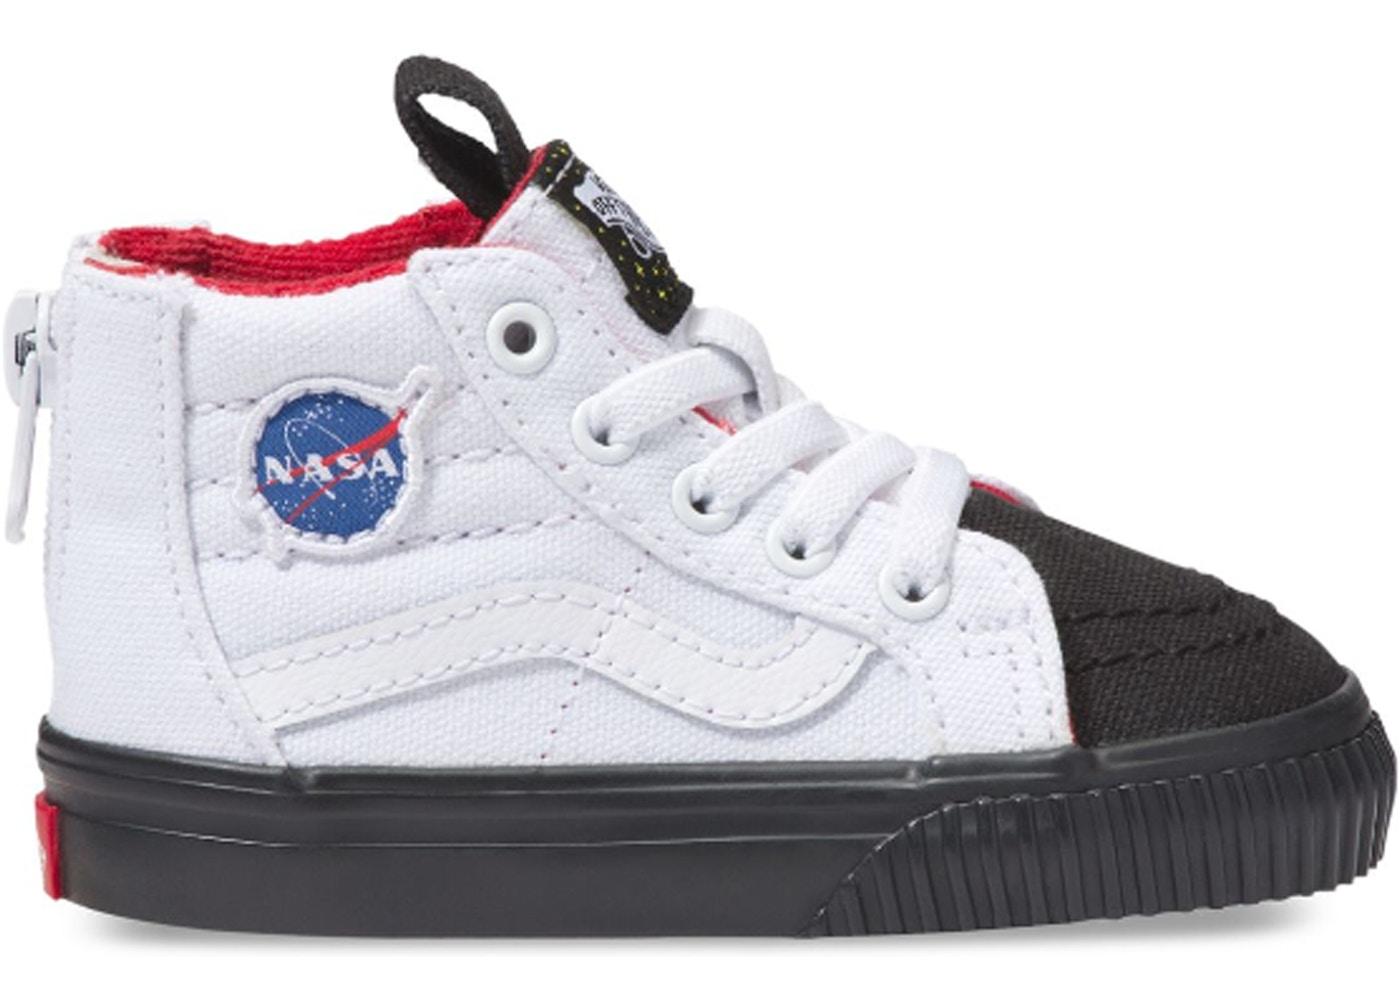 379a14bf77d8c4 Vans Sk8-Hi Zip NASA Space Voyager True White (TD) - VN0A32R3UJS